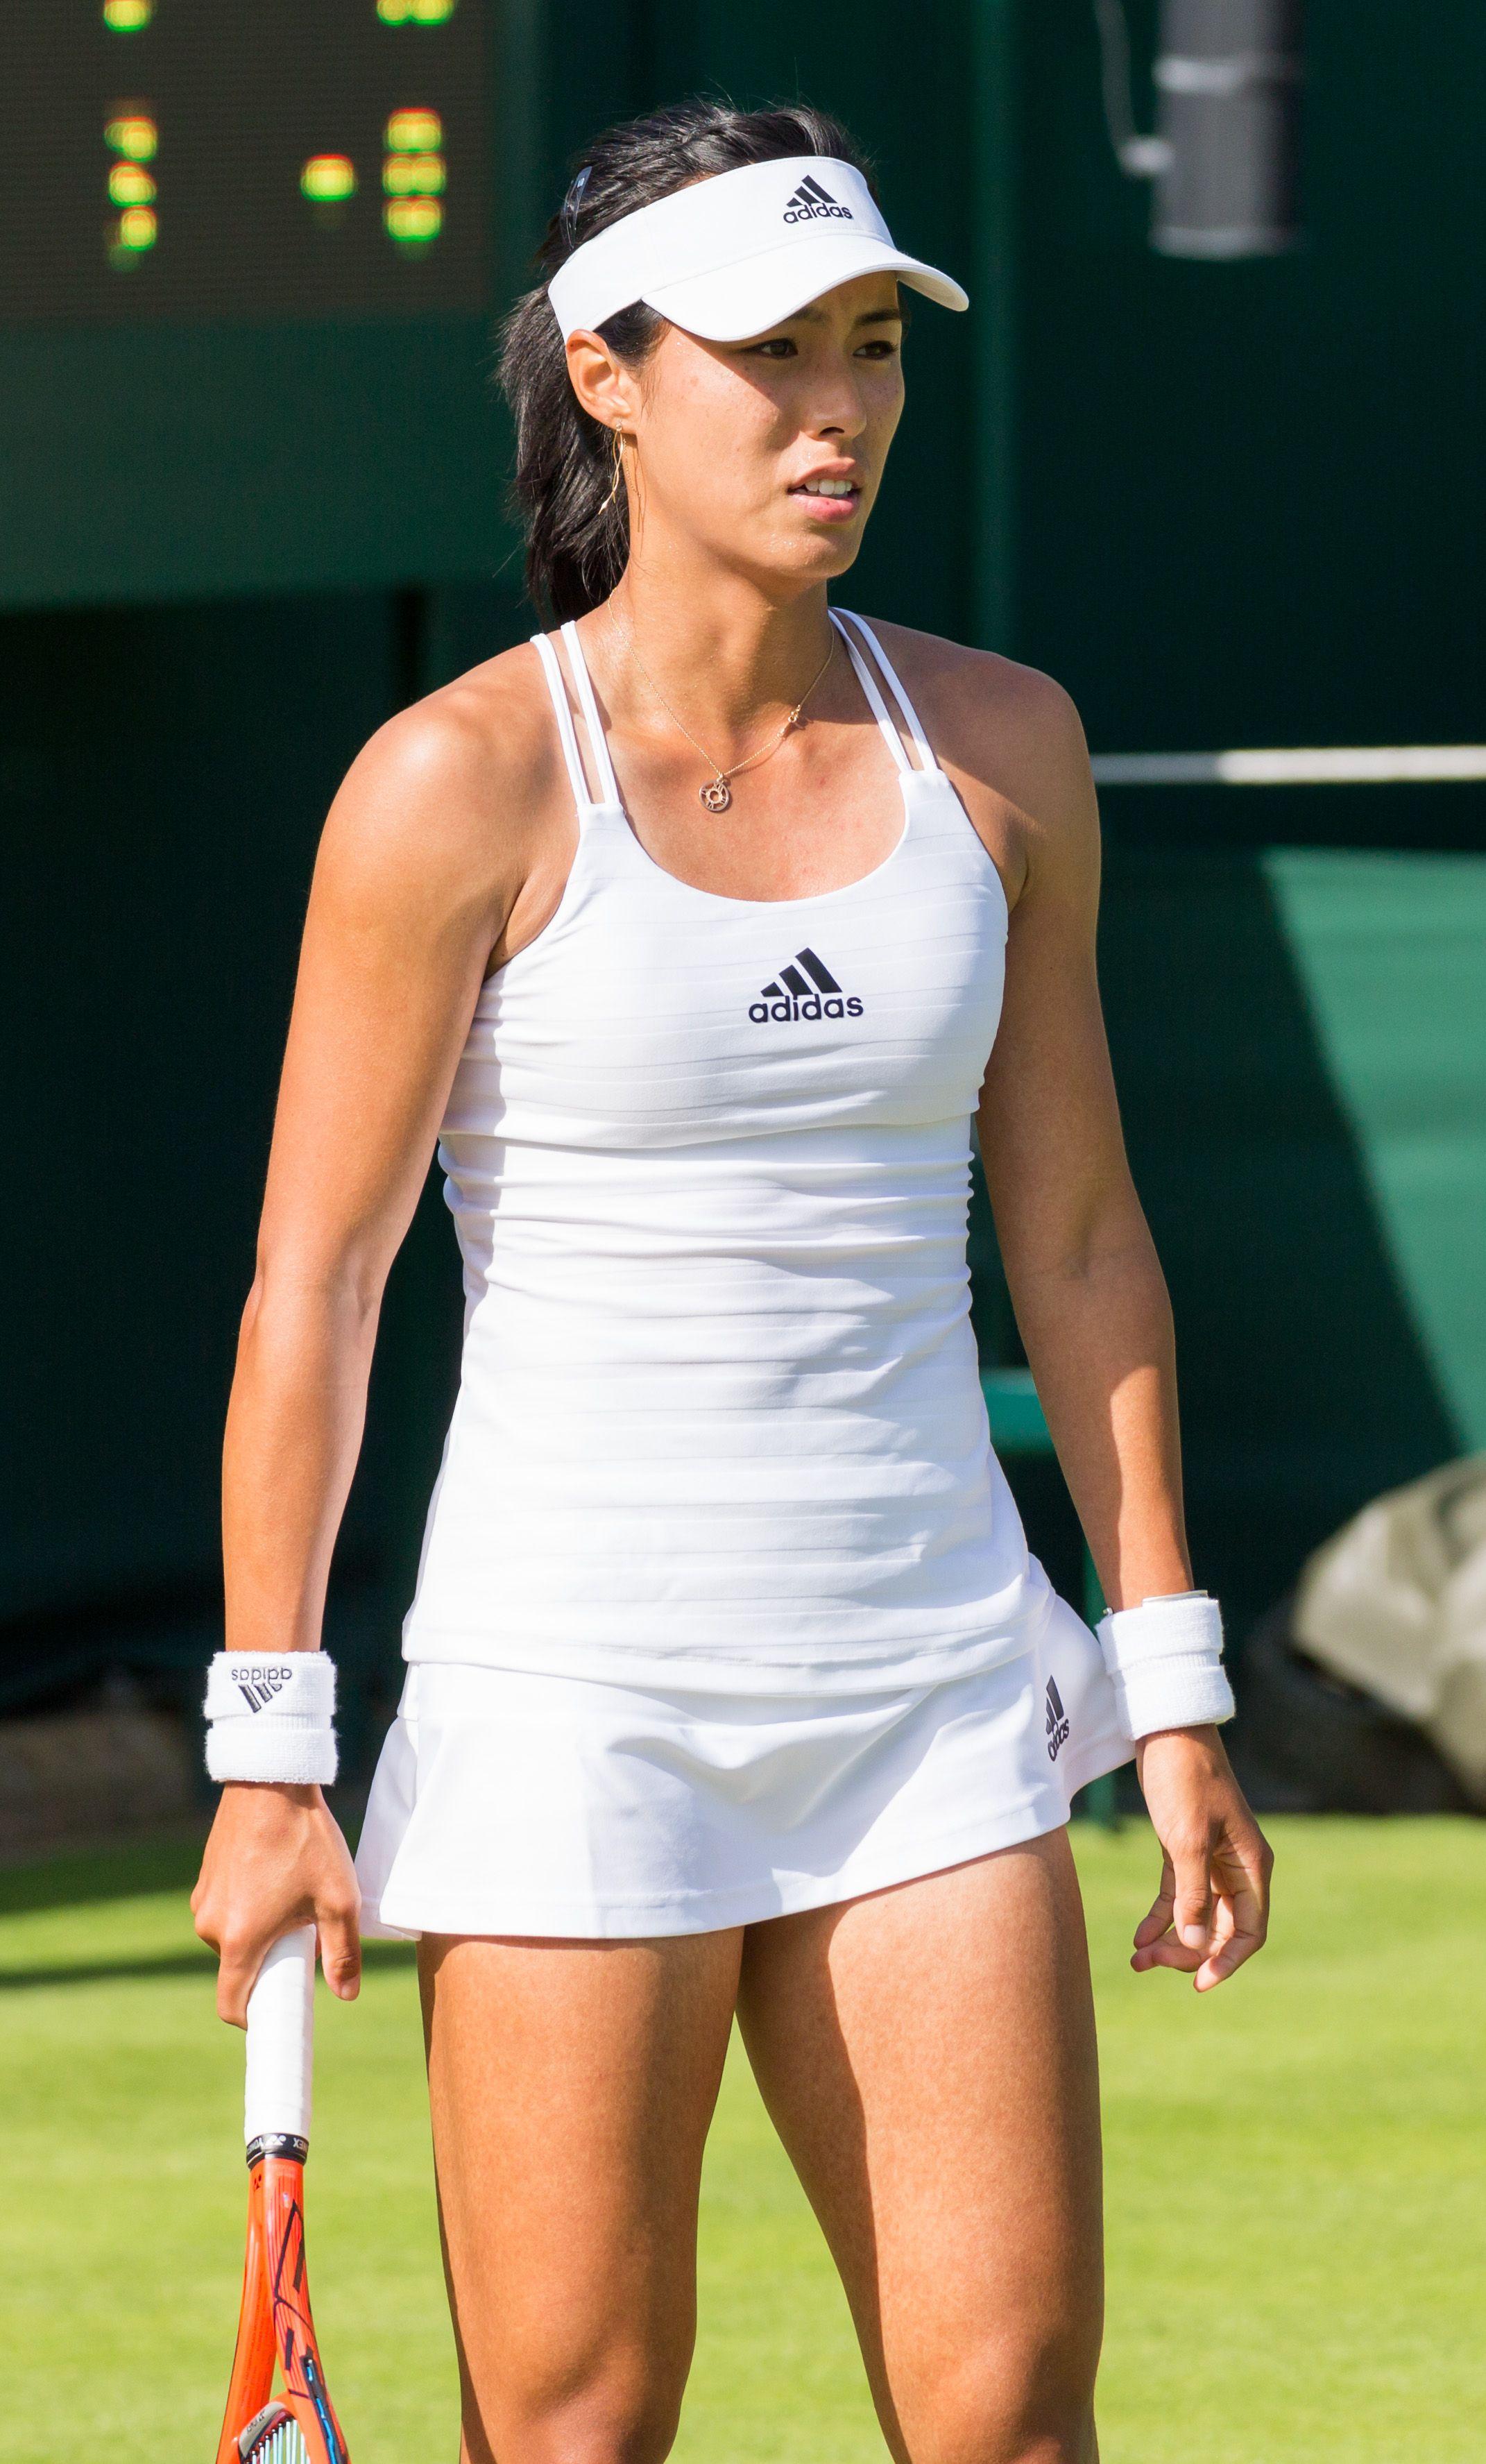 Wang Qiang Tenis China Tennis Players Female Tennis Clothes Tennis Players